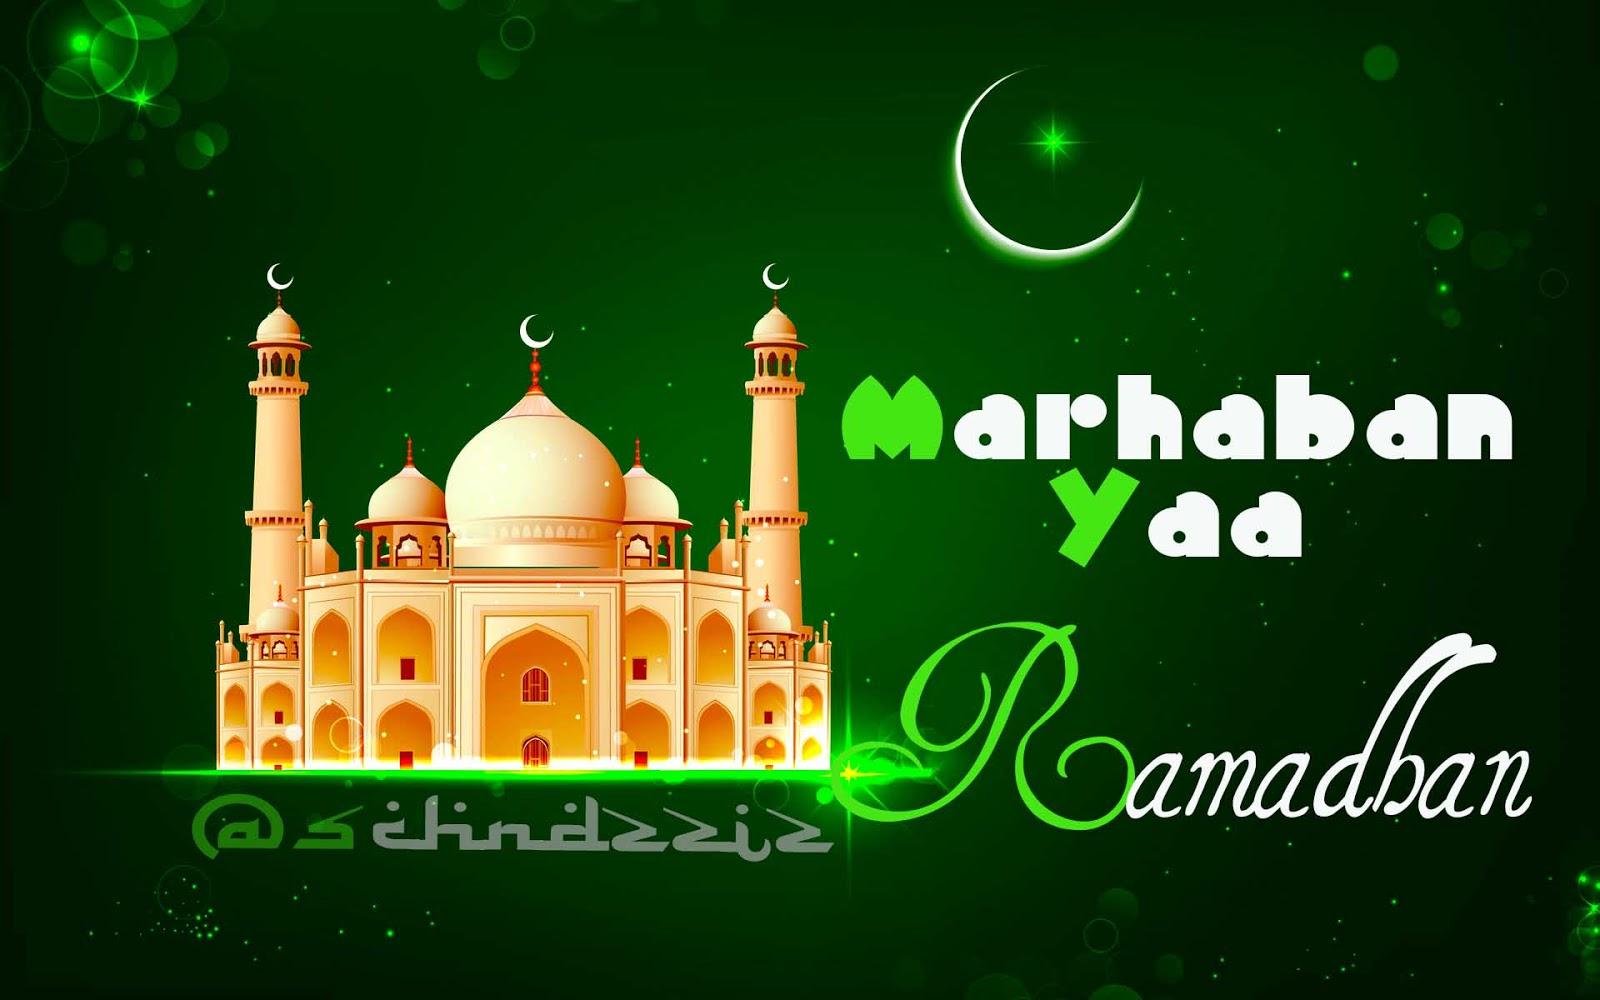 Koleksi Sketsa Gambar Tentang Ramadhan